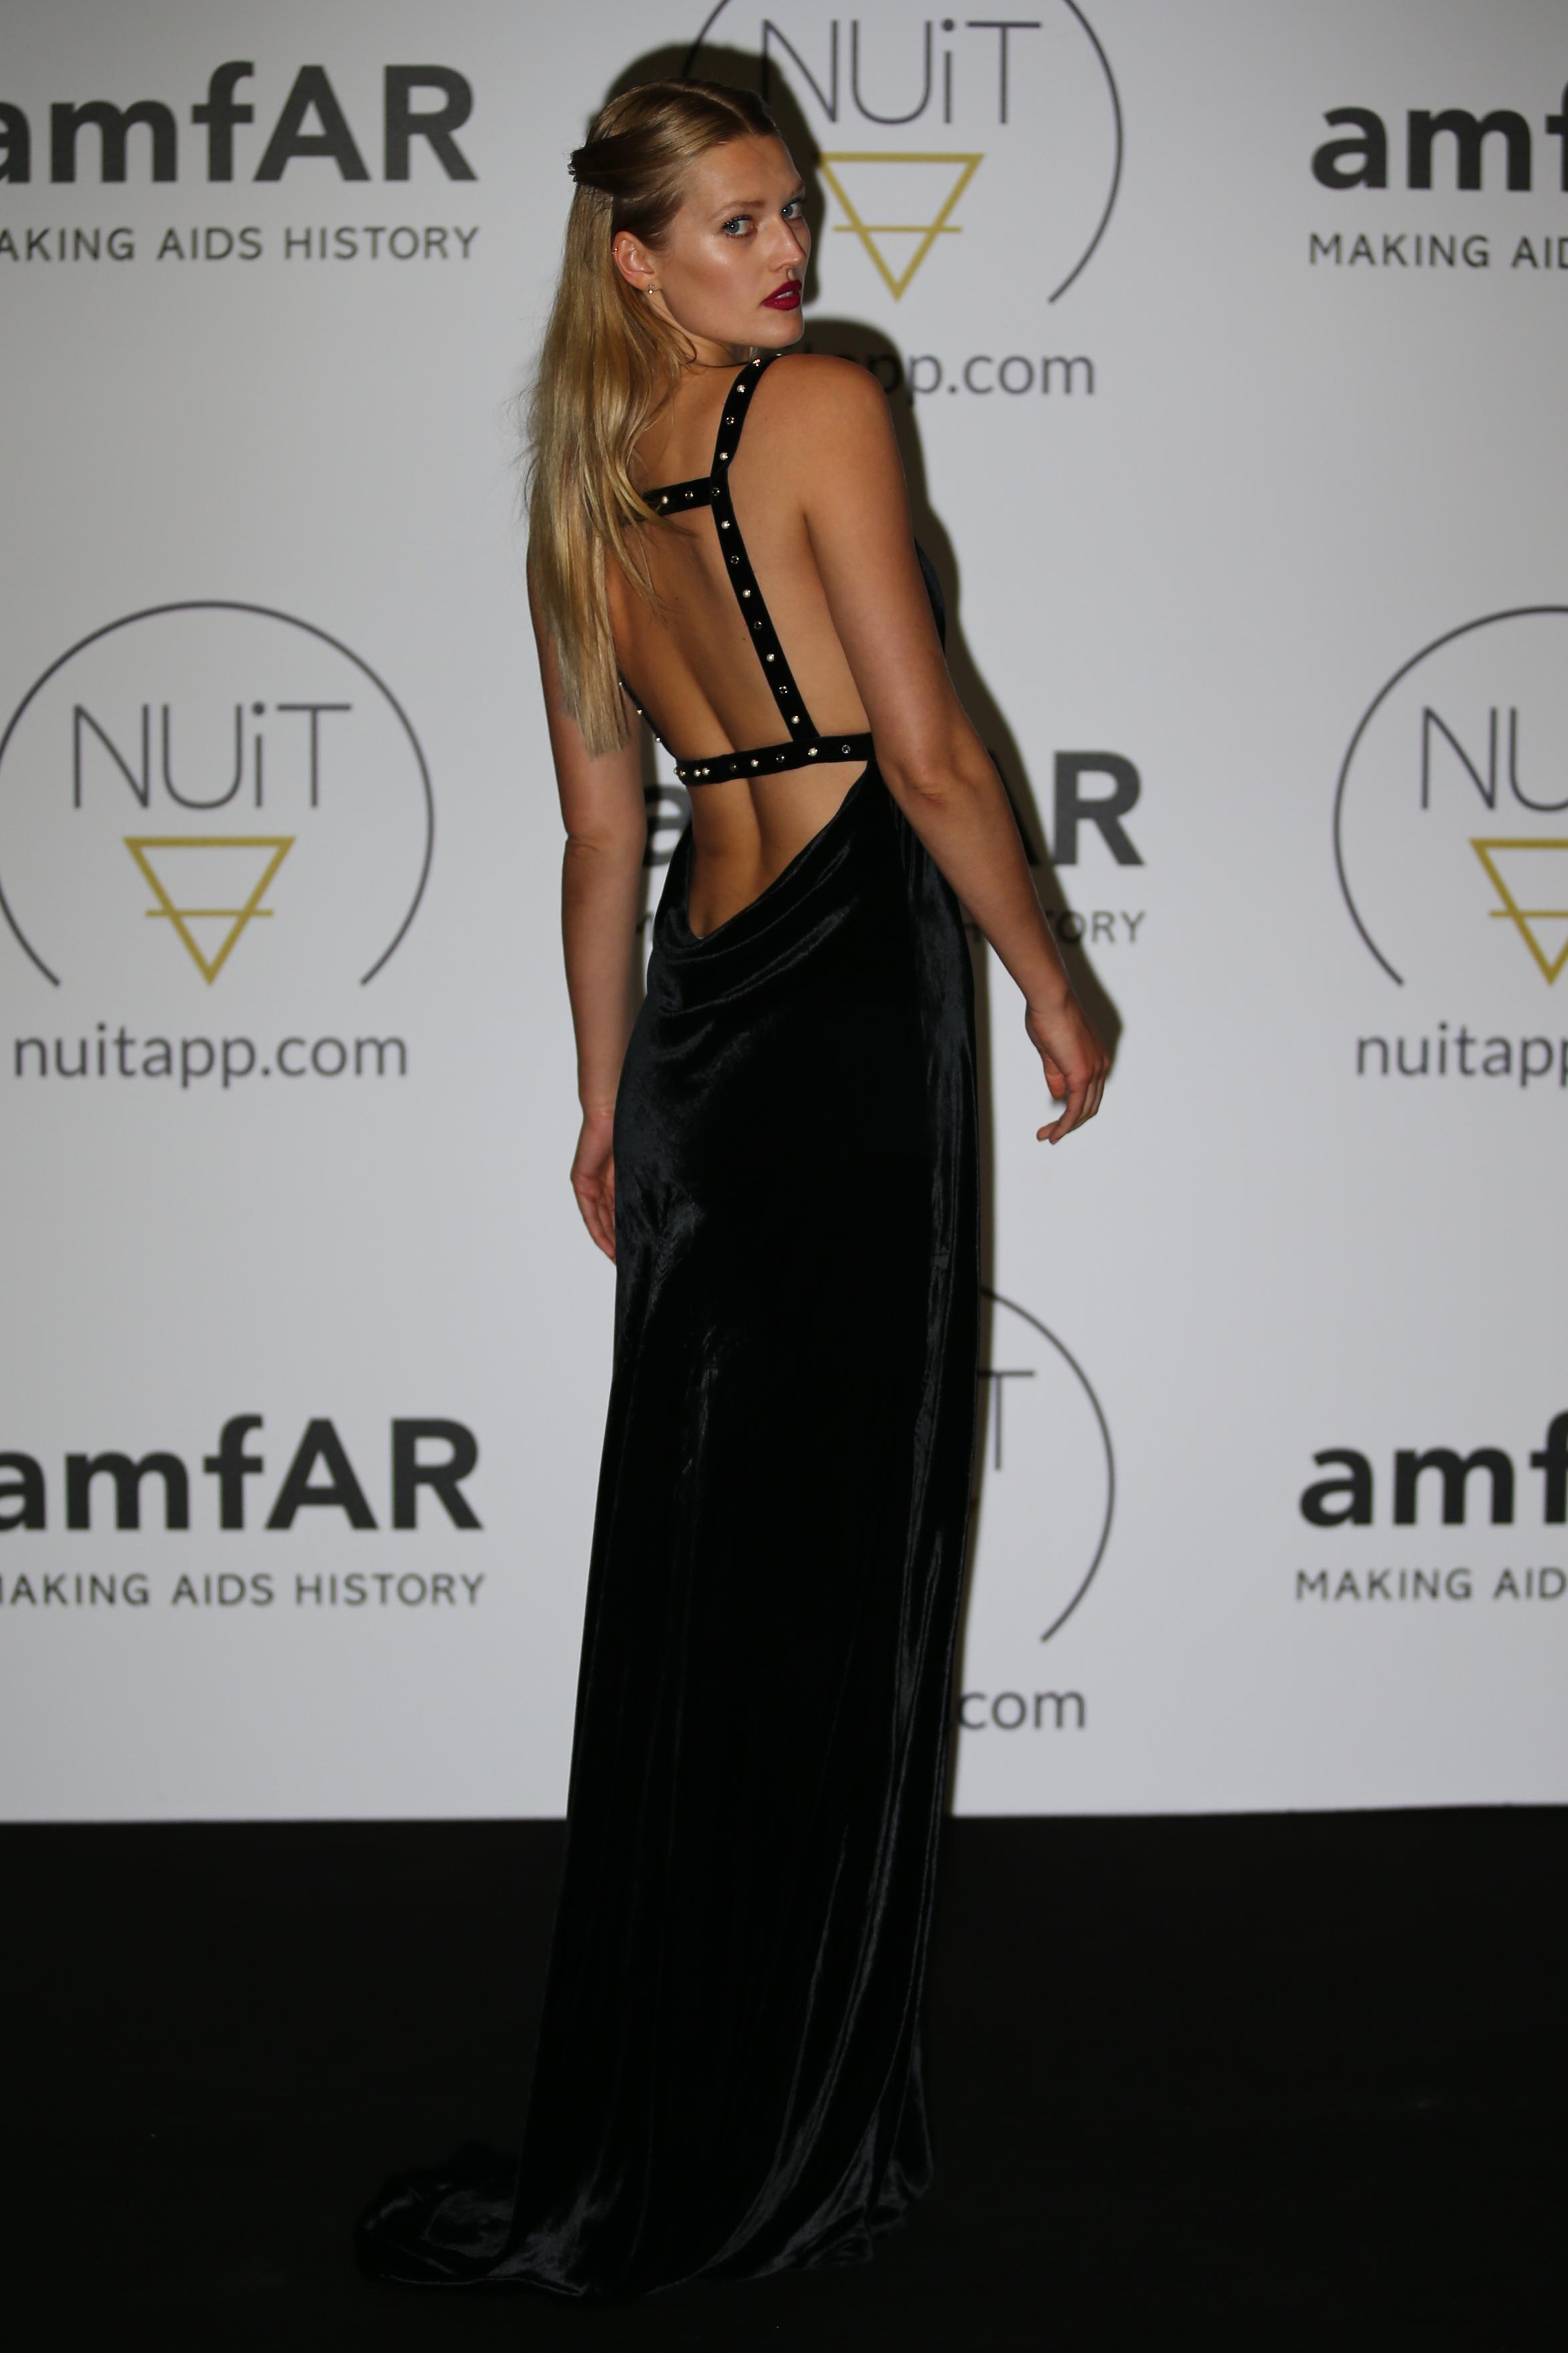 Twitter Antonia Toni Garrn nude (68 photos), Pussy, Sideboobs, Twitter, lingerie 2019